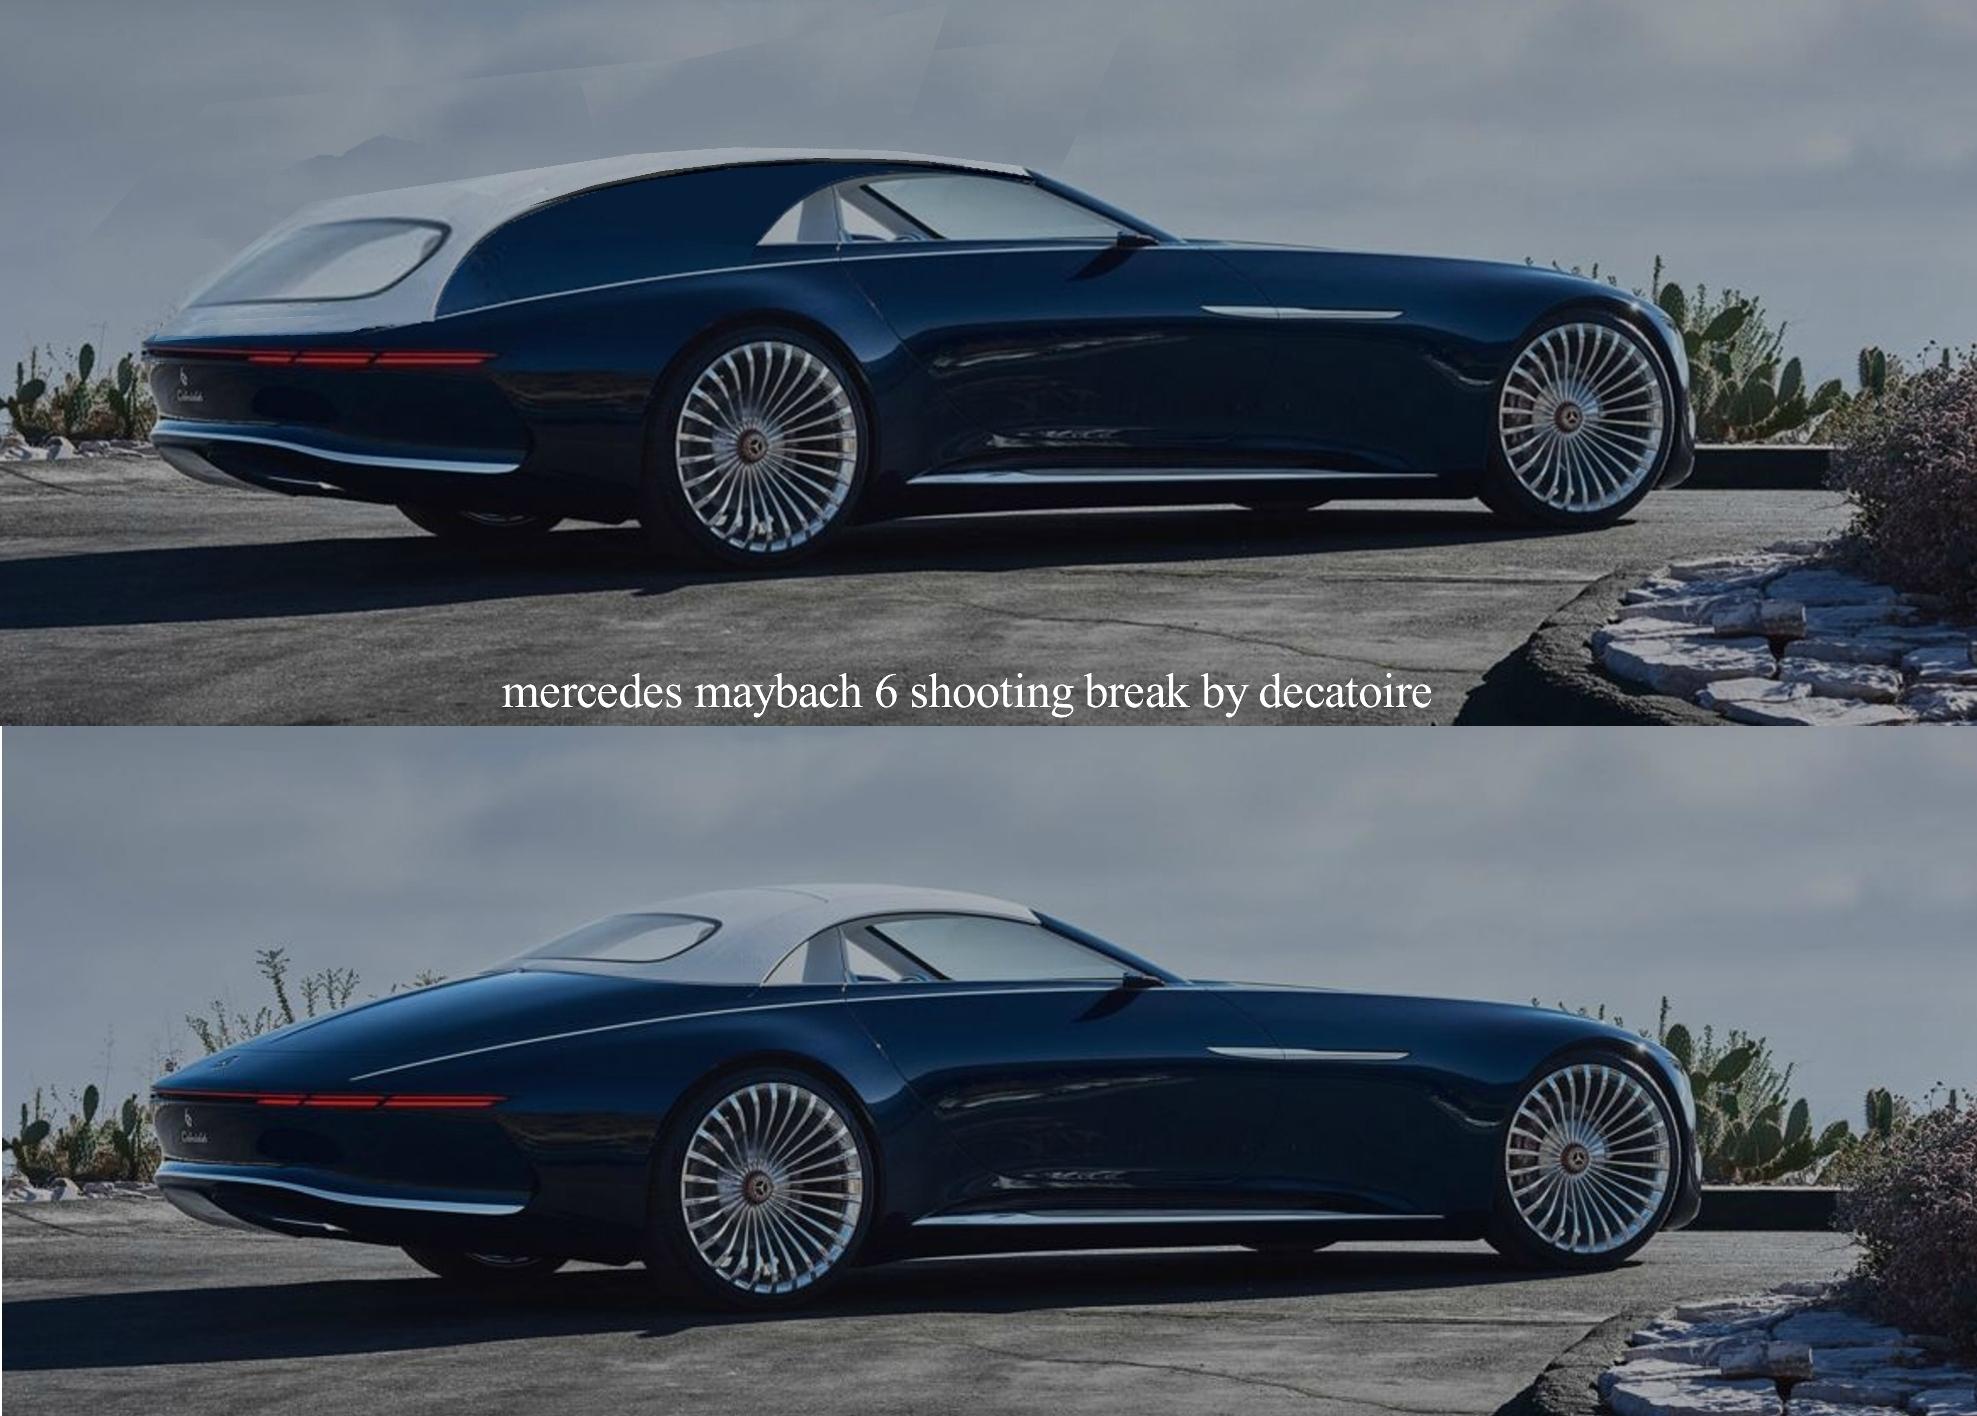 Mercedes-Maybach 6 shooting break